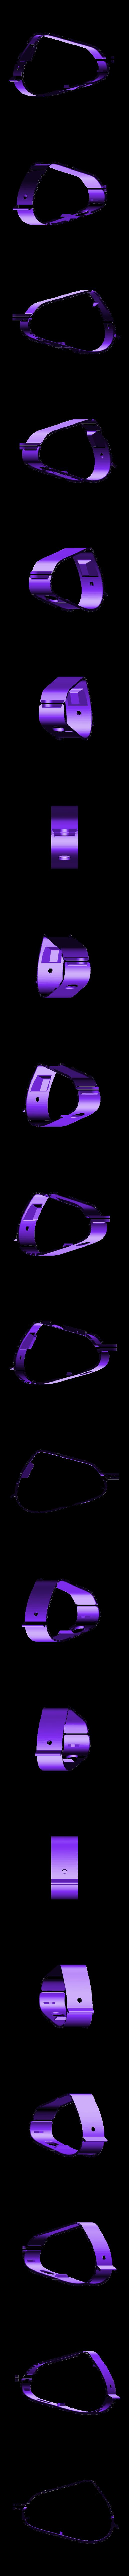 ps4-clamp.stl Download free STL file PS4 Display Tripod Mount • Template to 3D print, Adafruit